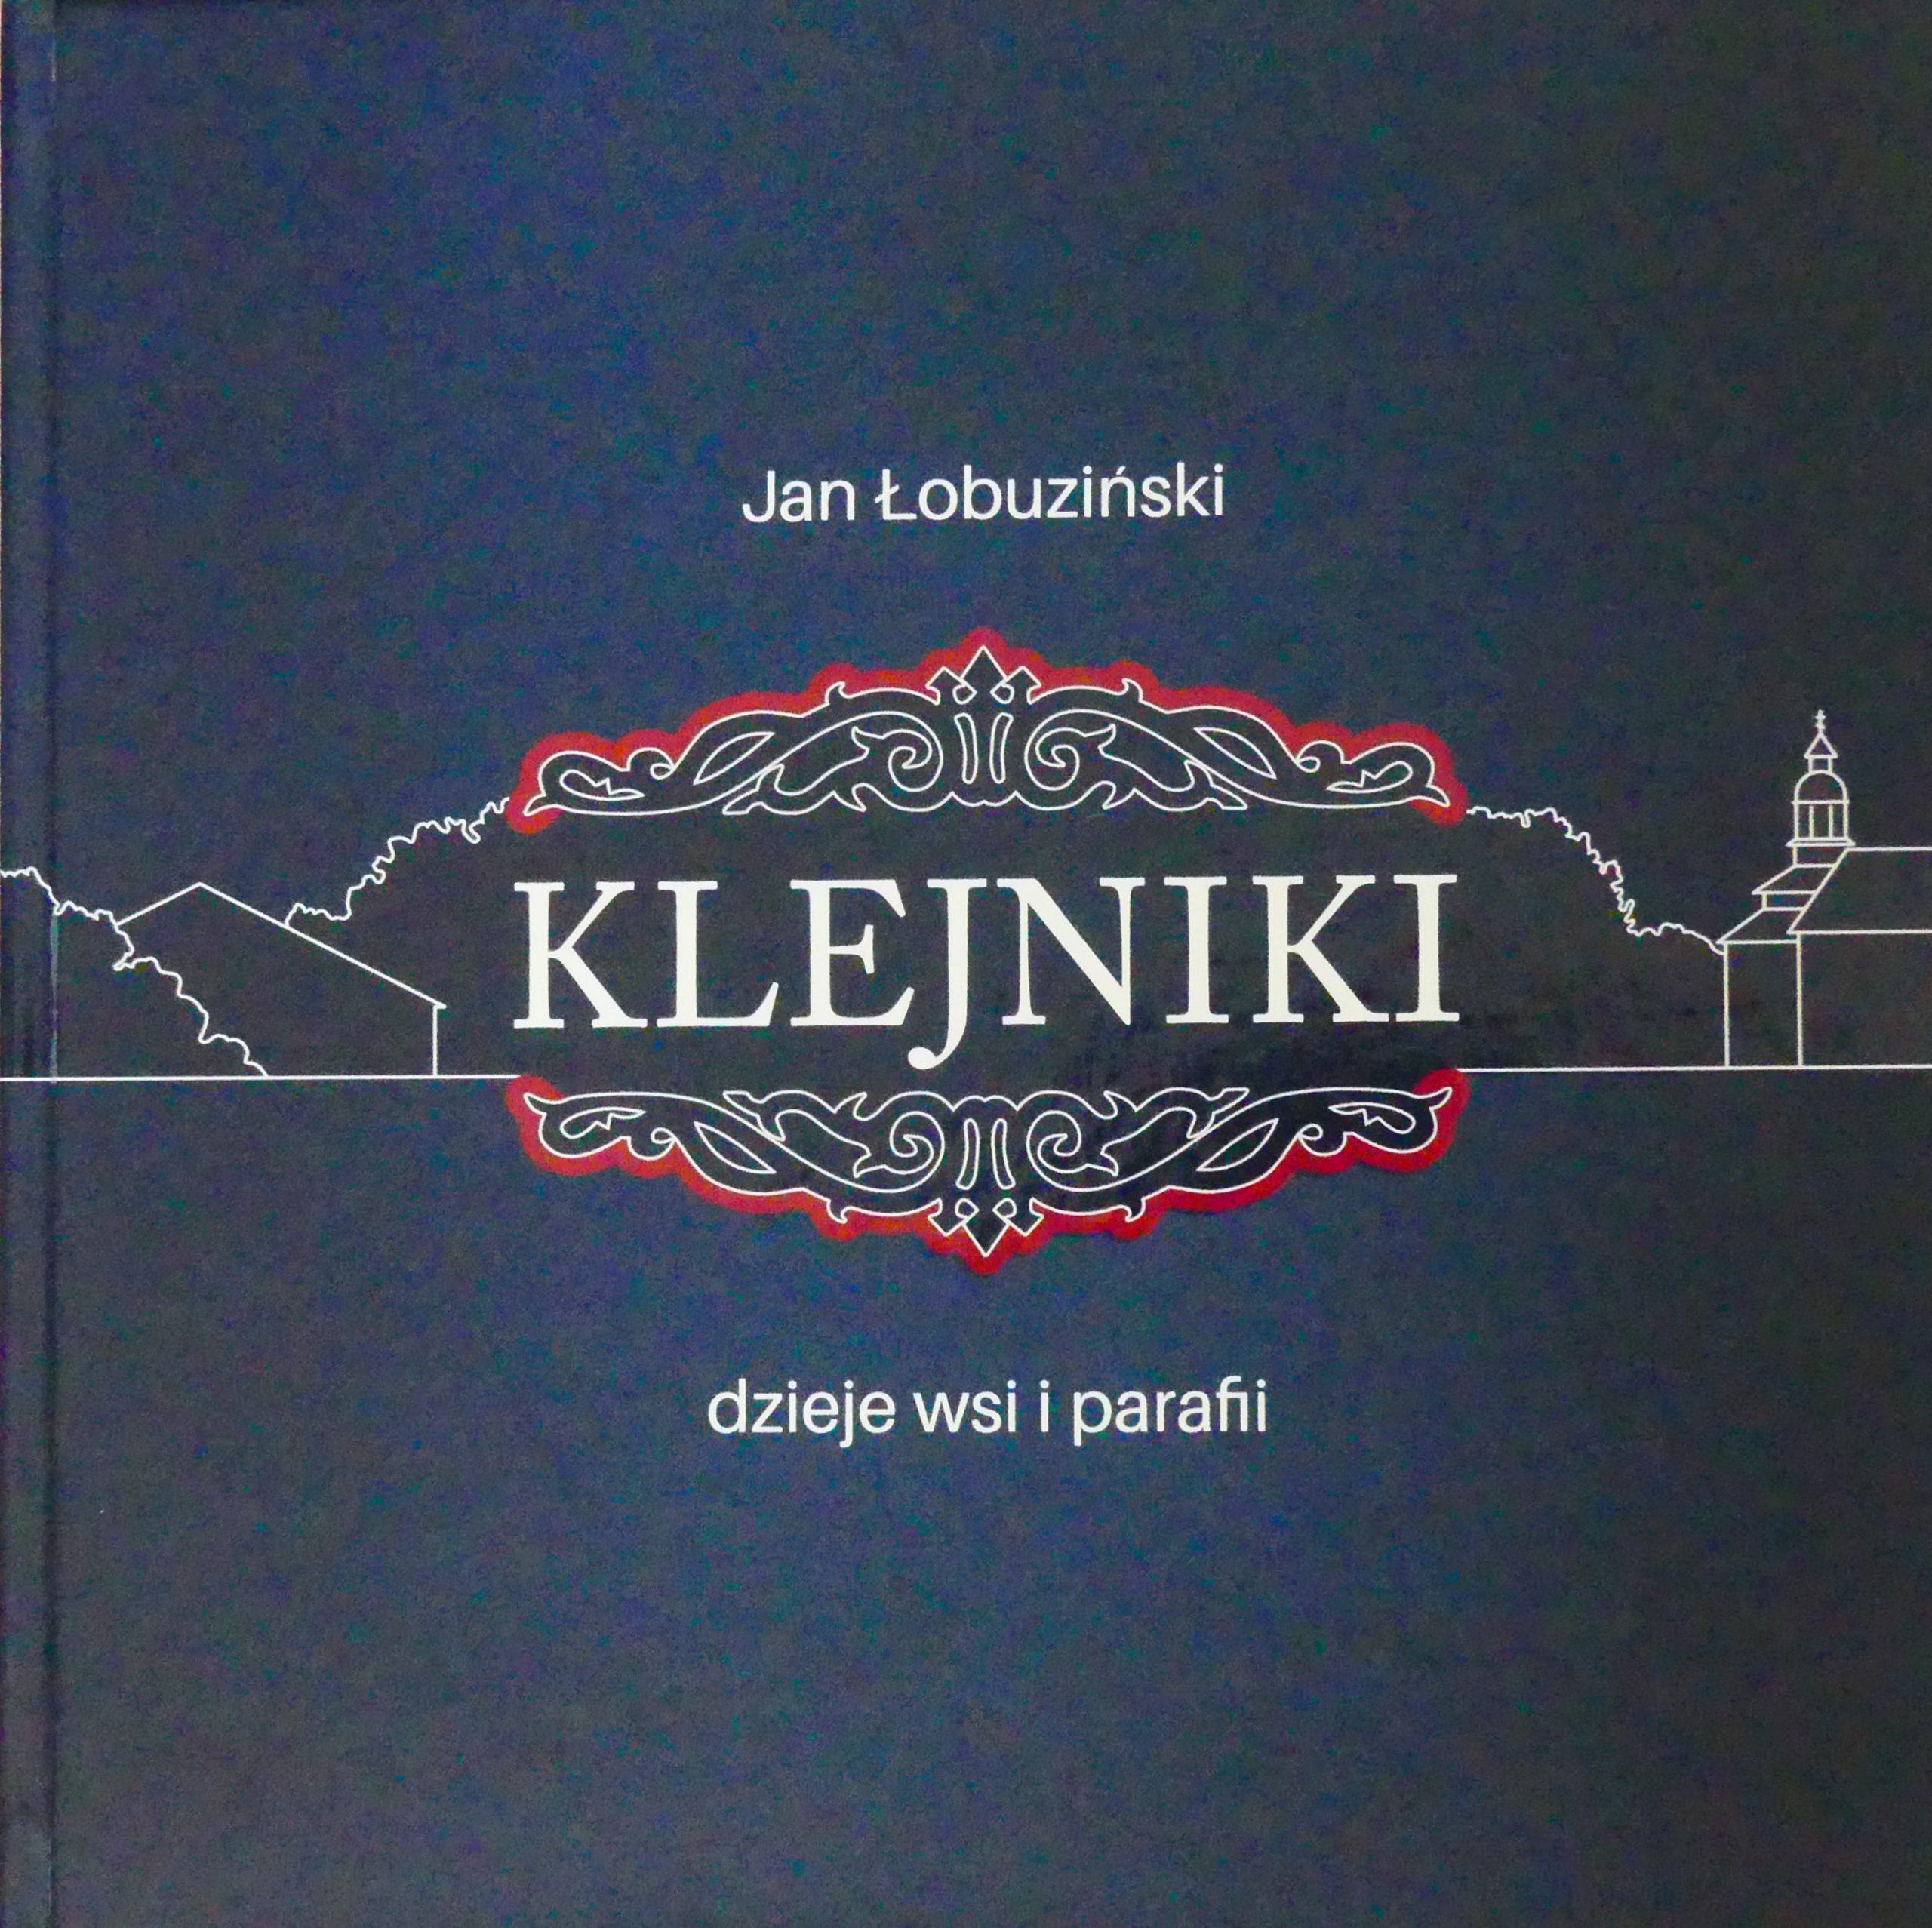 """Klejniki. Dzieje wsi i parafii"" – цінне джерело знань про минуле"